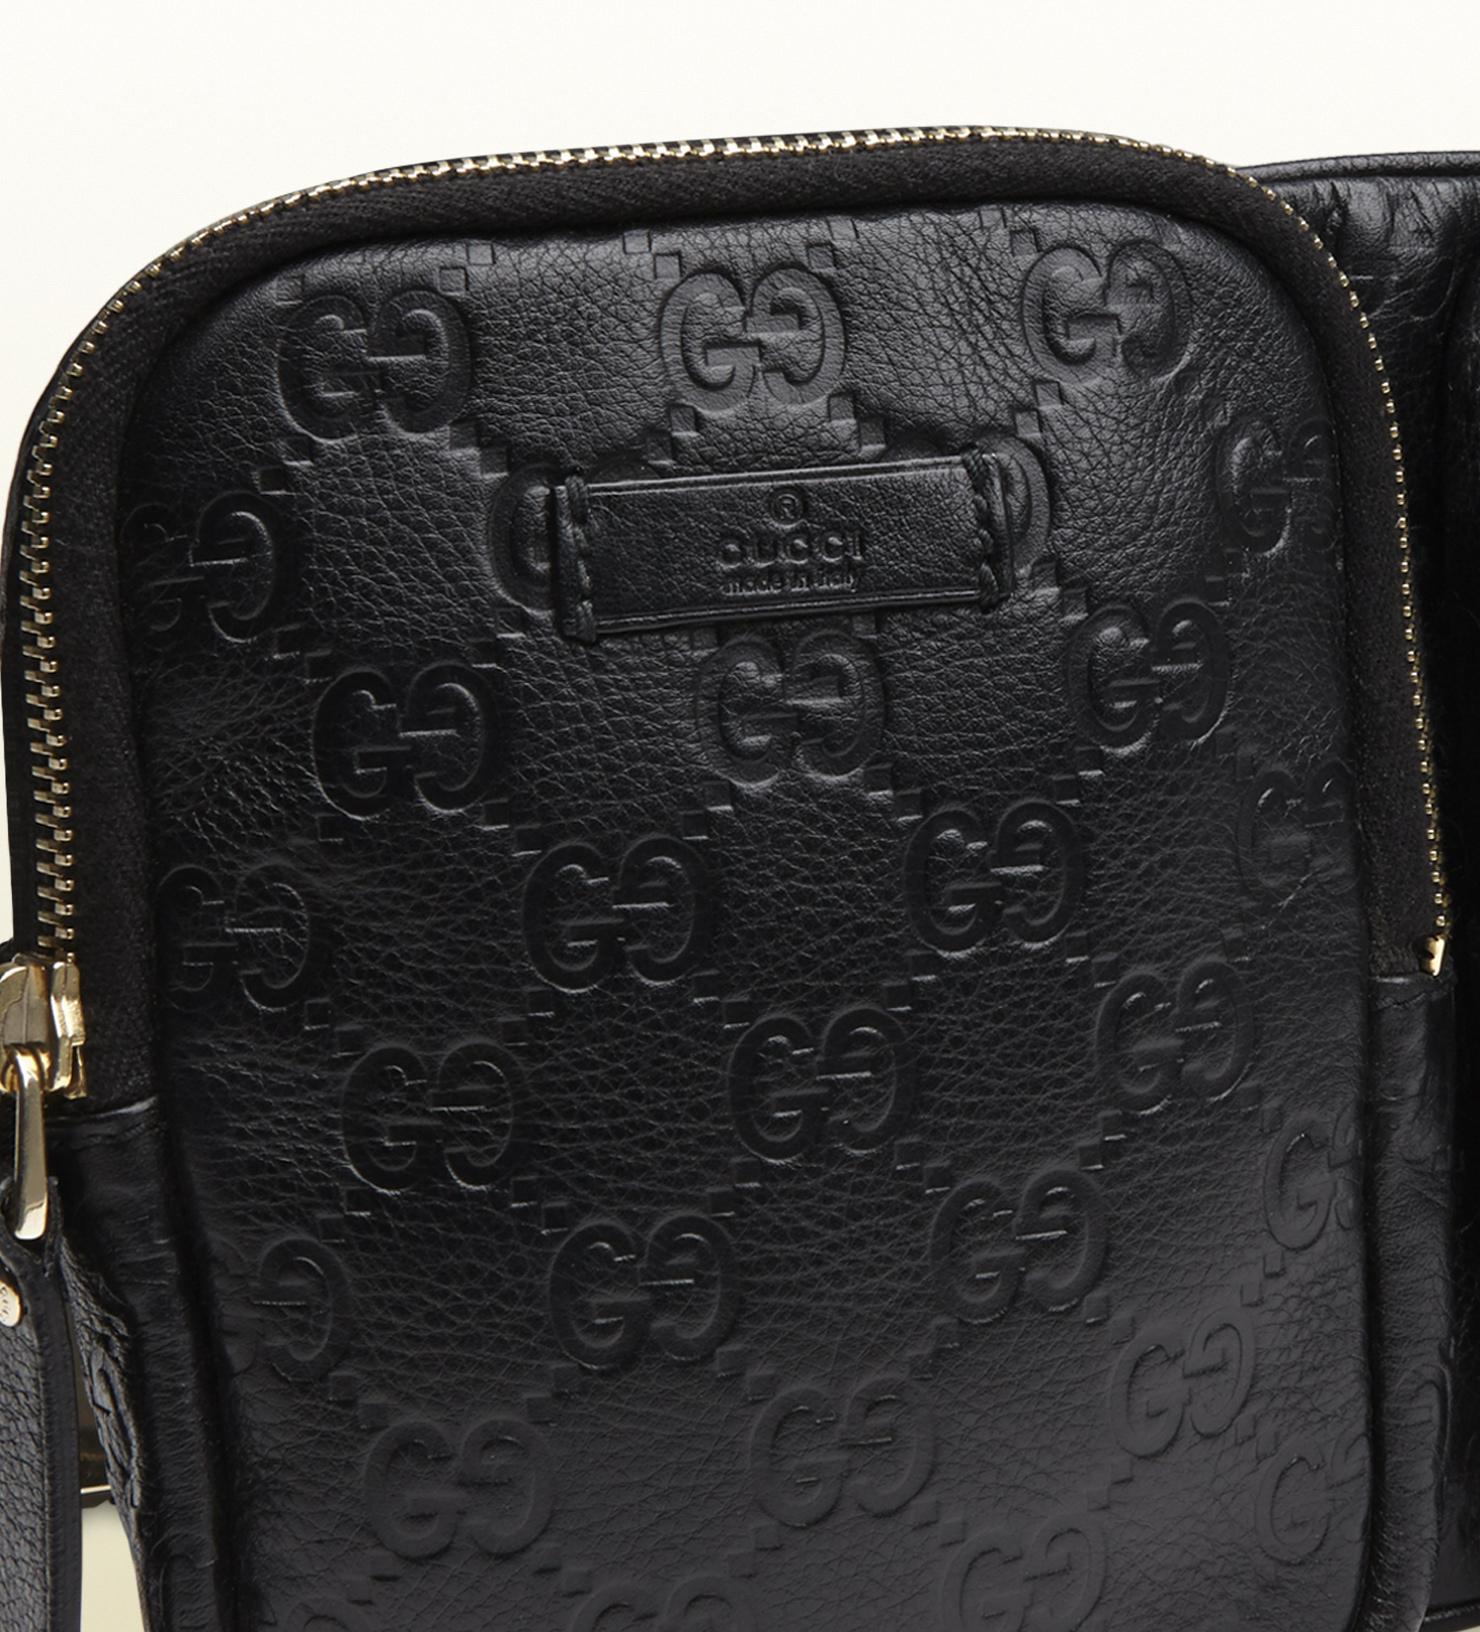 cb1abd62cf66 Gucci Black Ssima Leather Belt Bag in Black for Men - Lyst